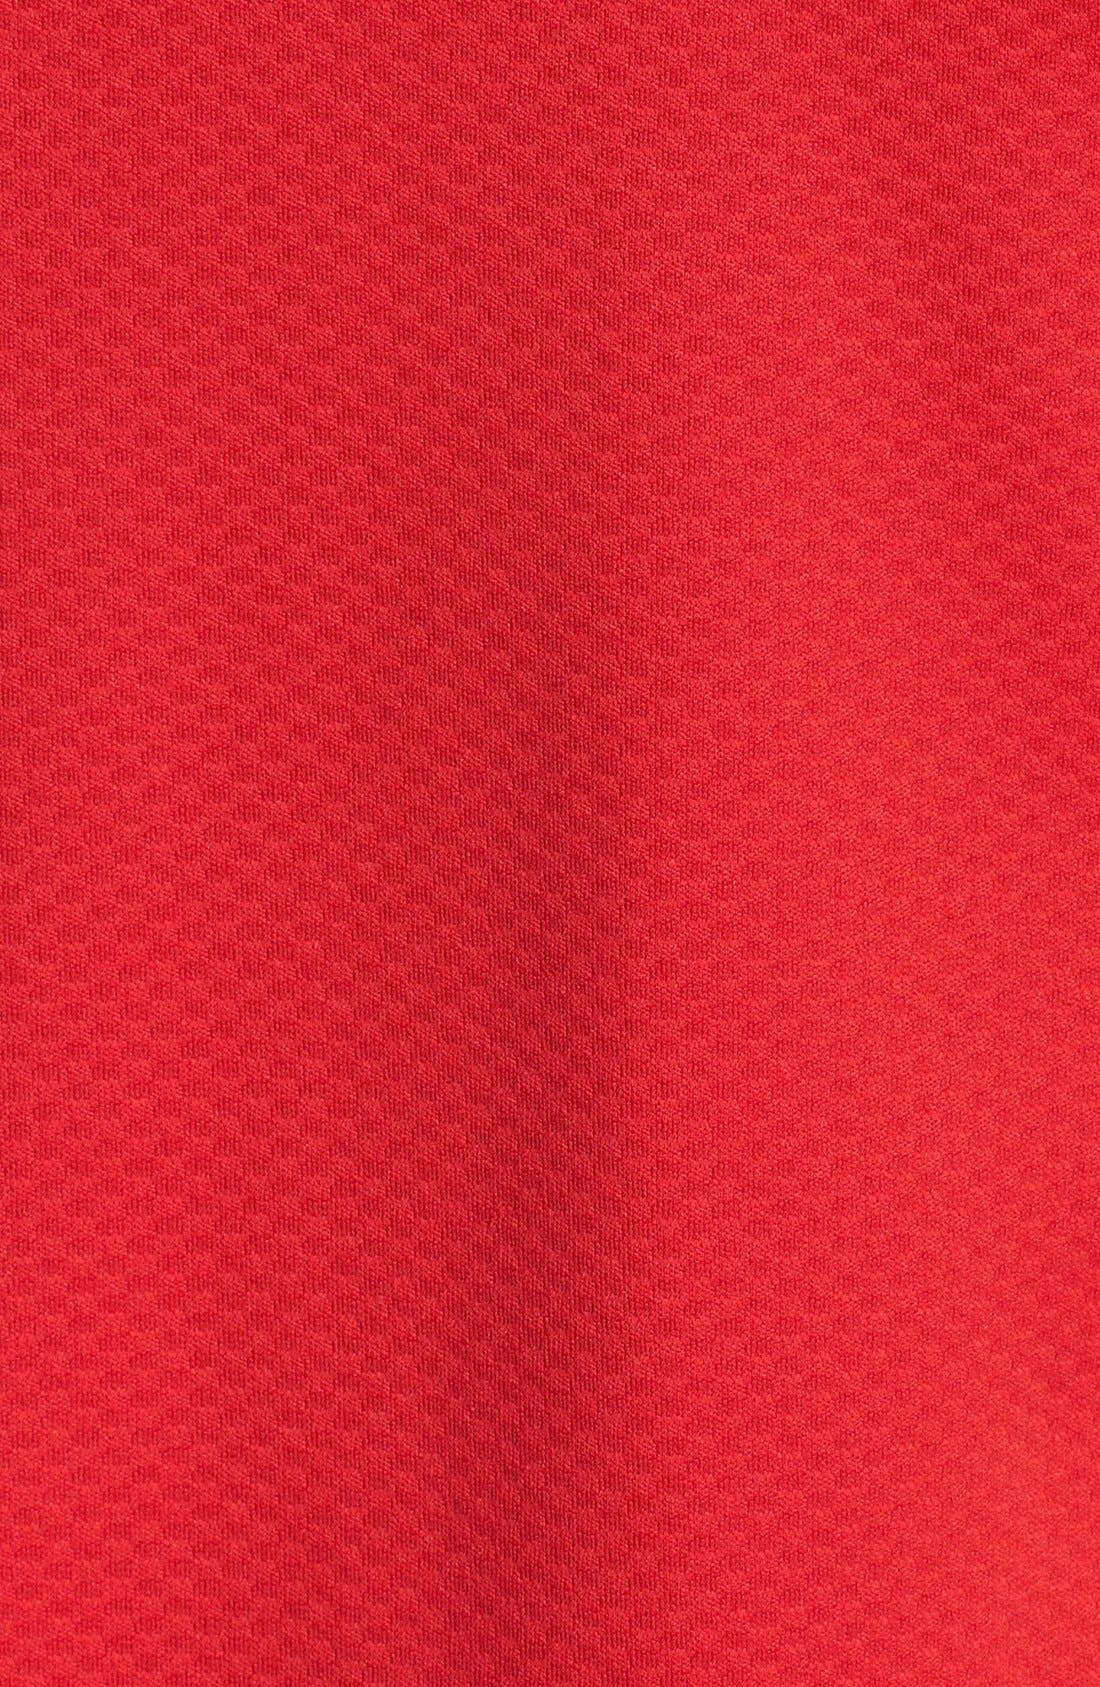 Alternate Image 3  - Under Armour 'Tech' Loose Fit Fleece Hoodie